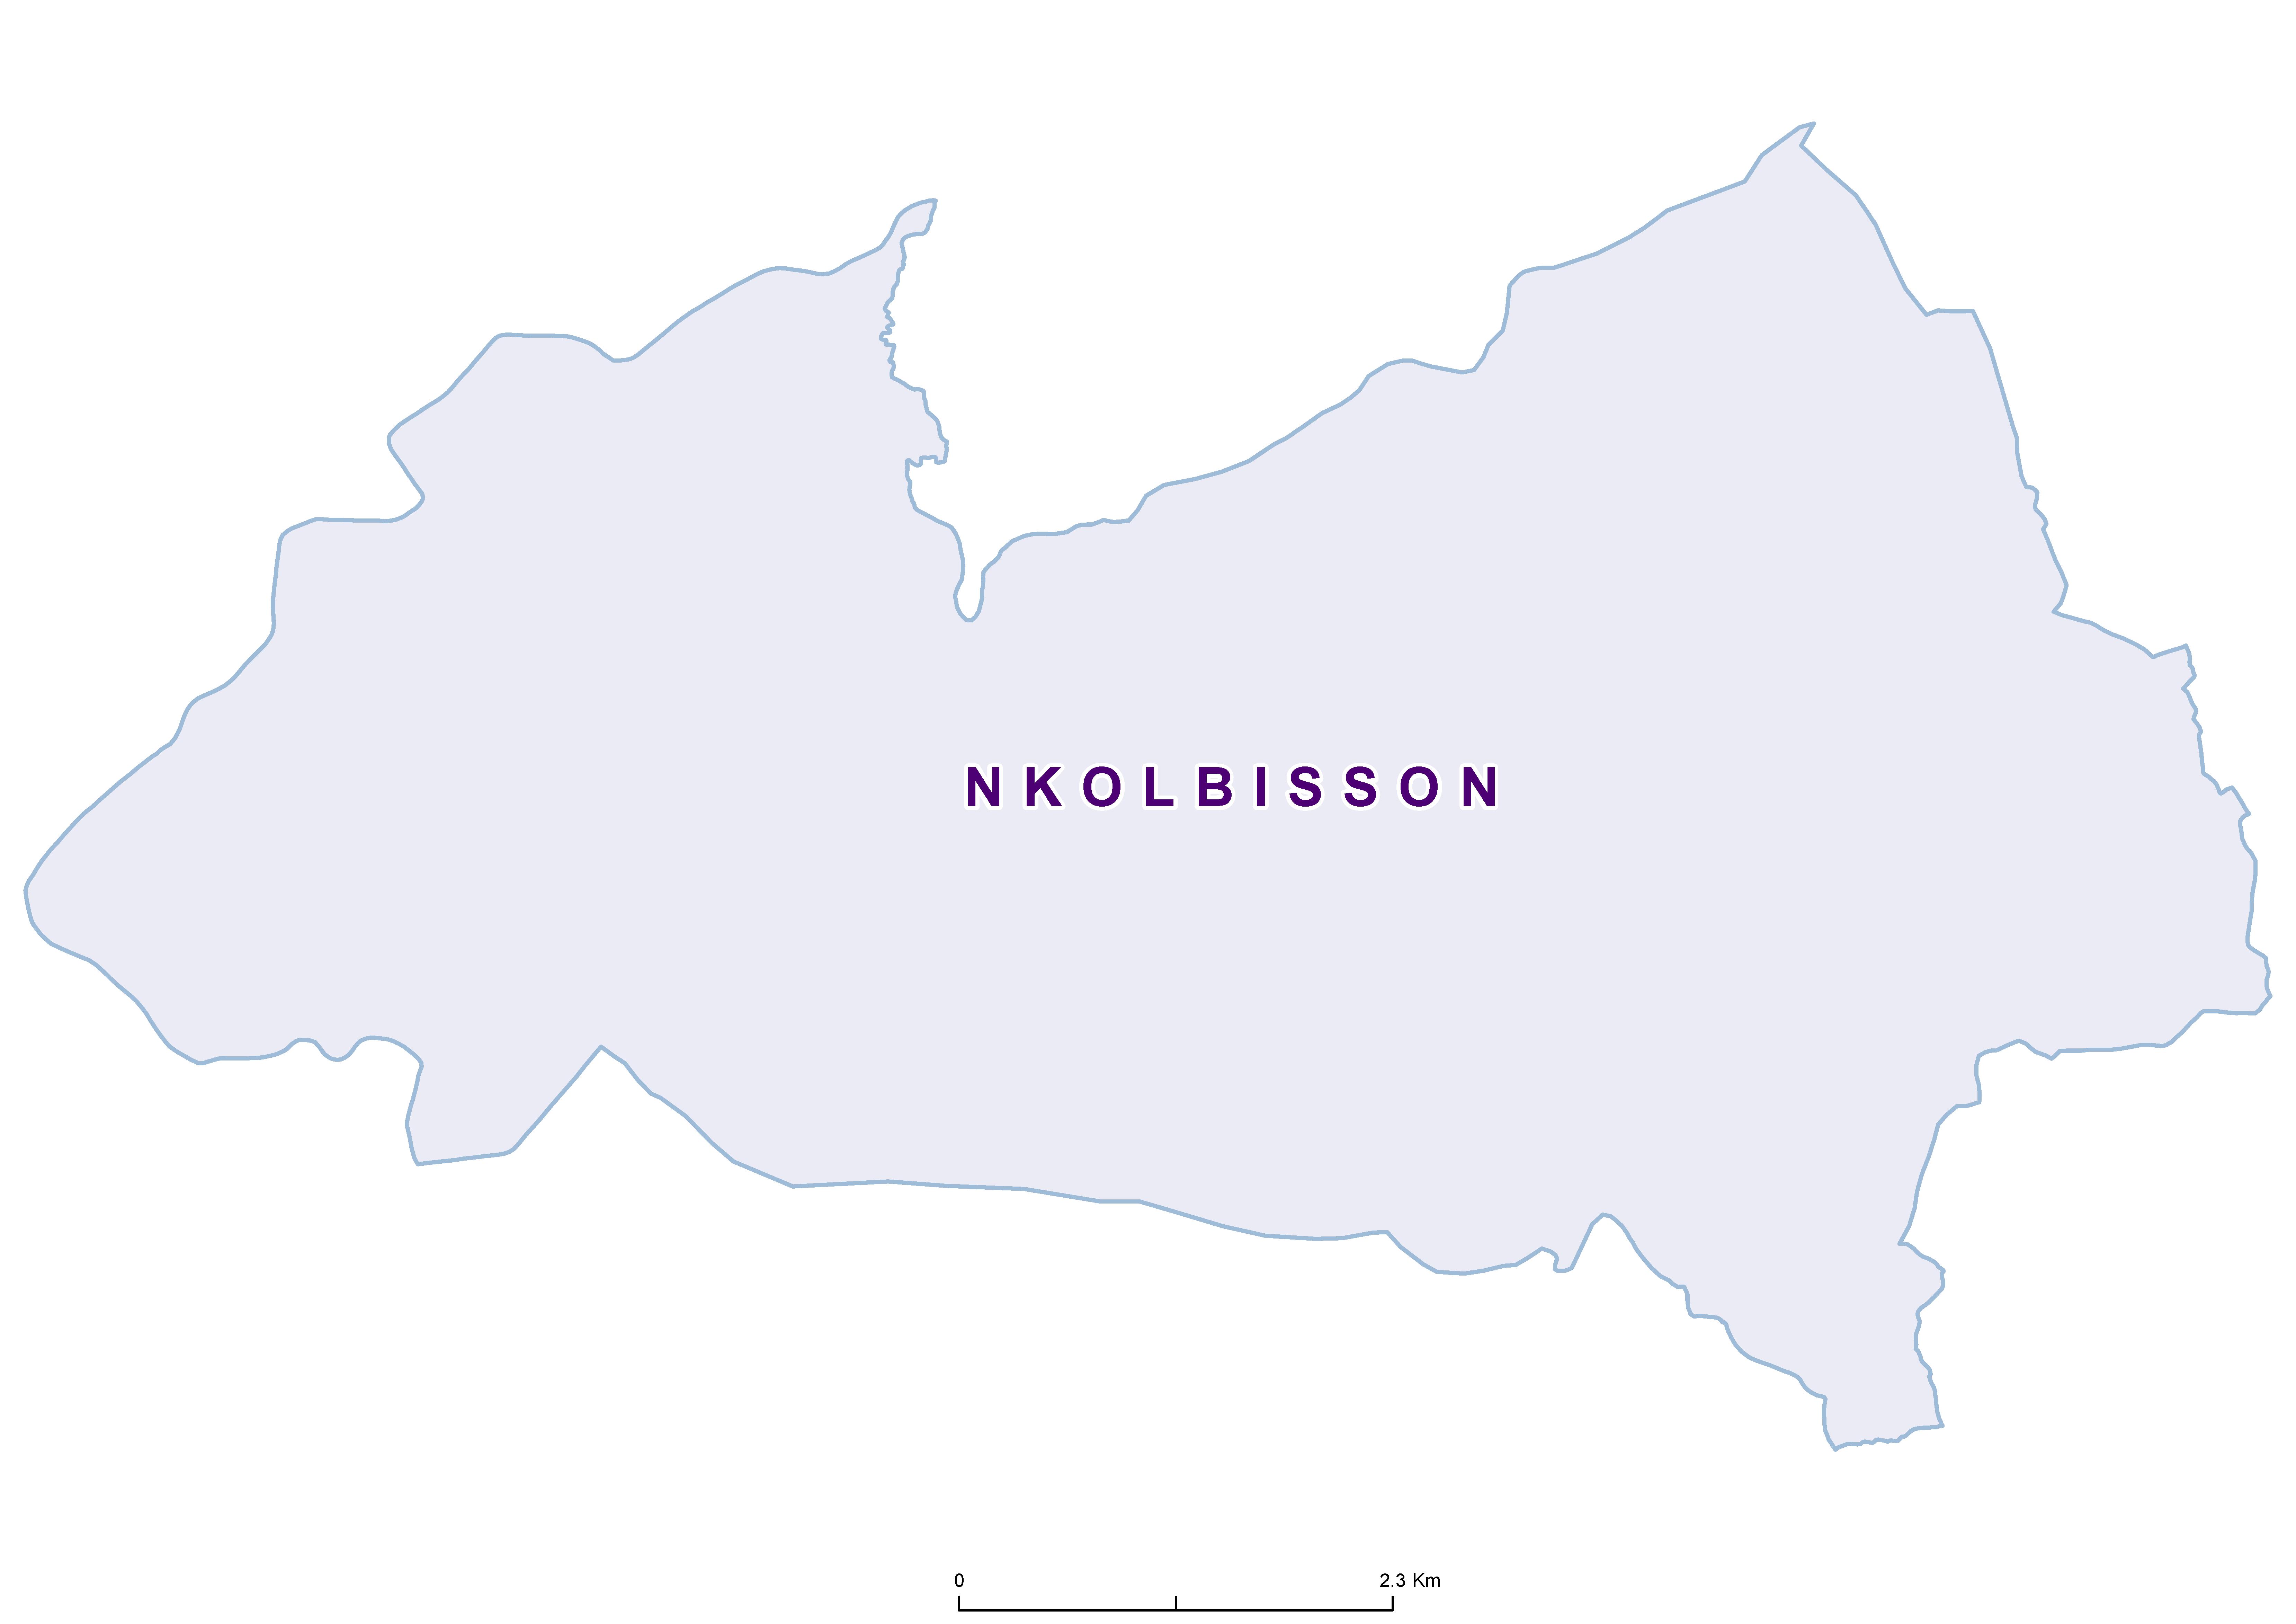 Nkolbisson Mean STH 19850001